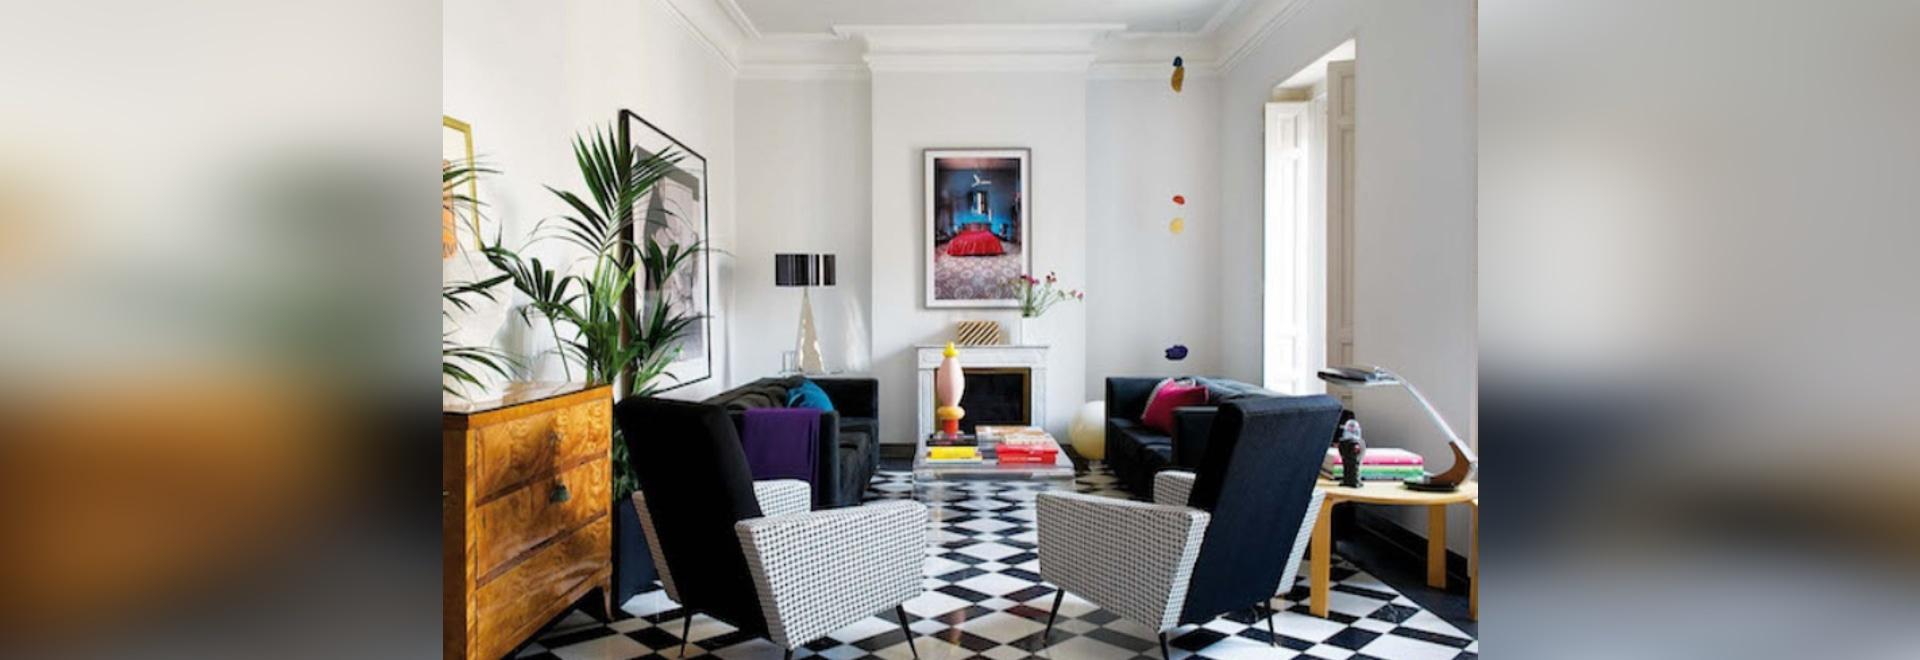 The Best 2019 Interior Design Trends